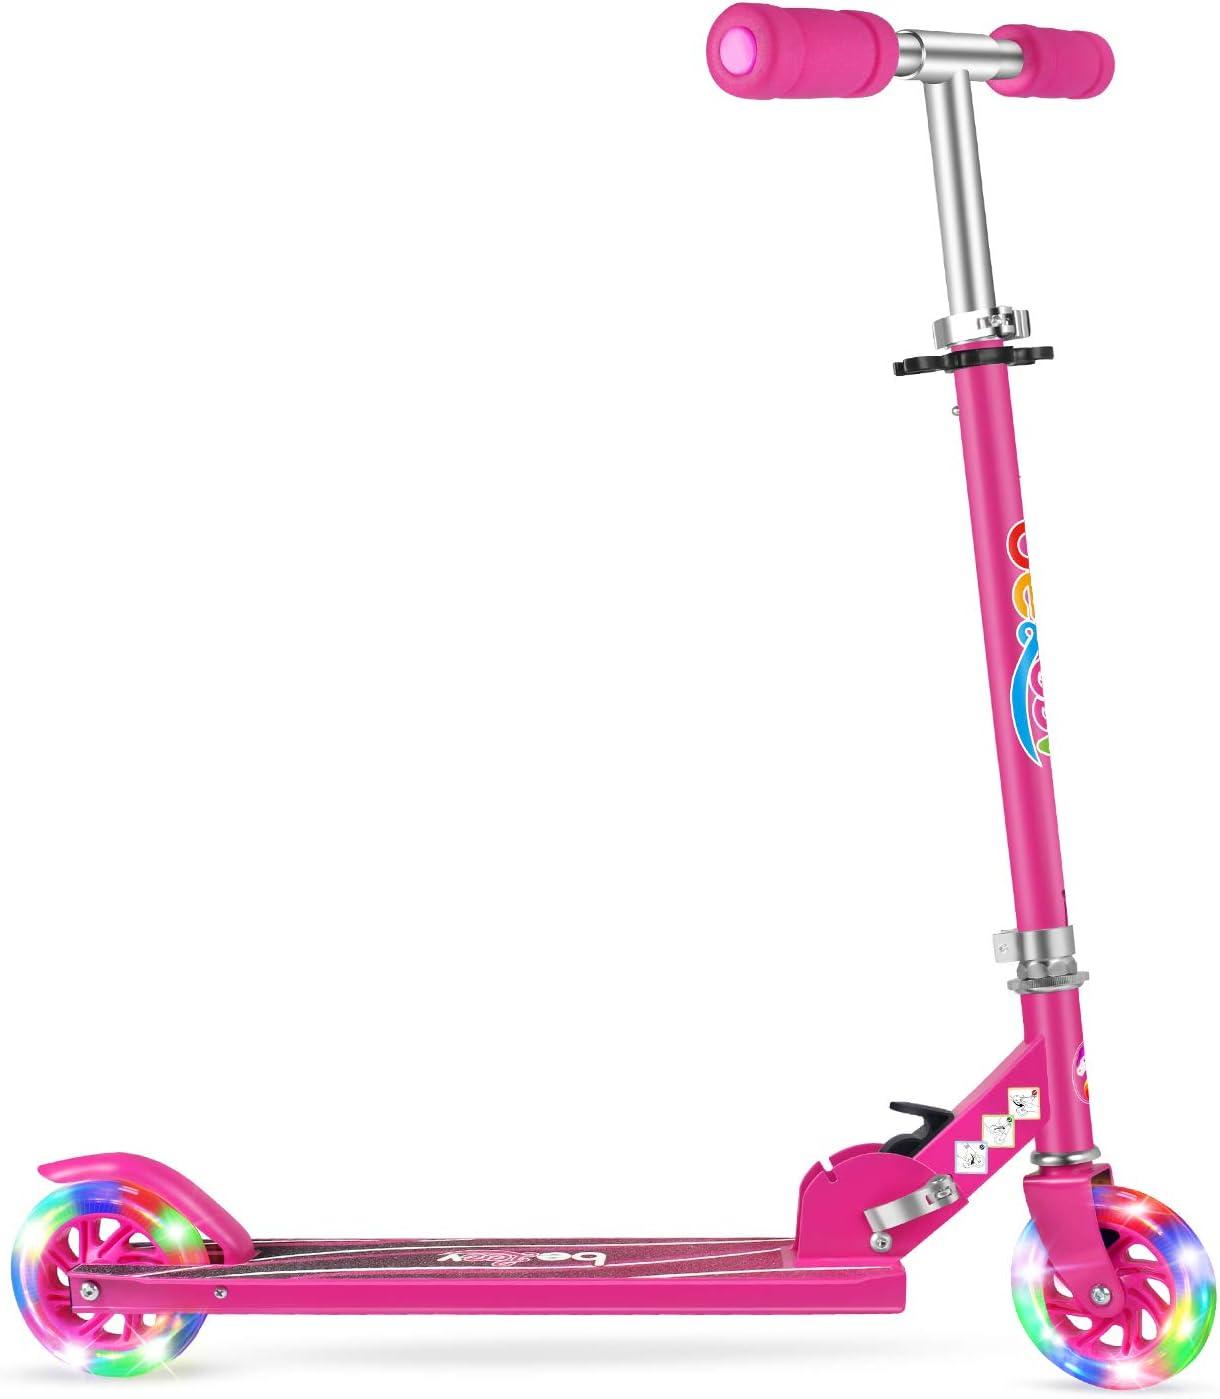 New sales Beleev V1 Award-winning store Scooters for Kids 2 Folding Kick Gir Wheel Scooter